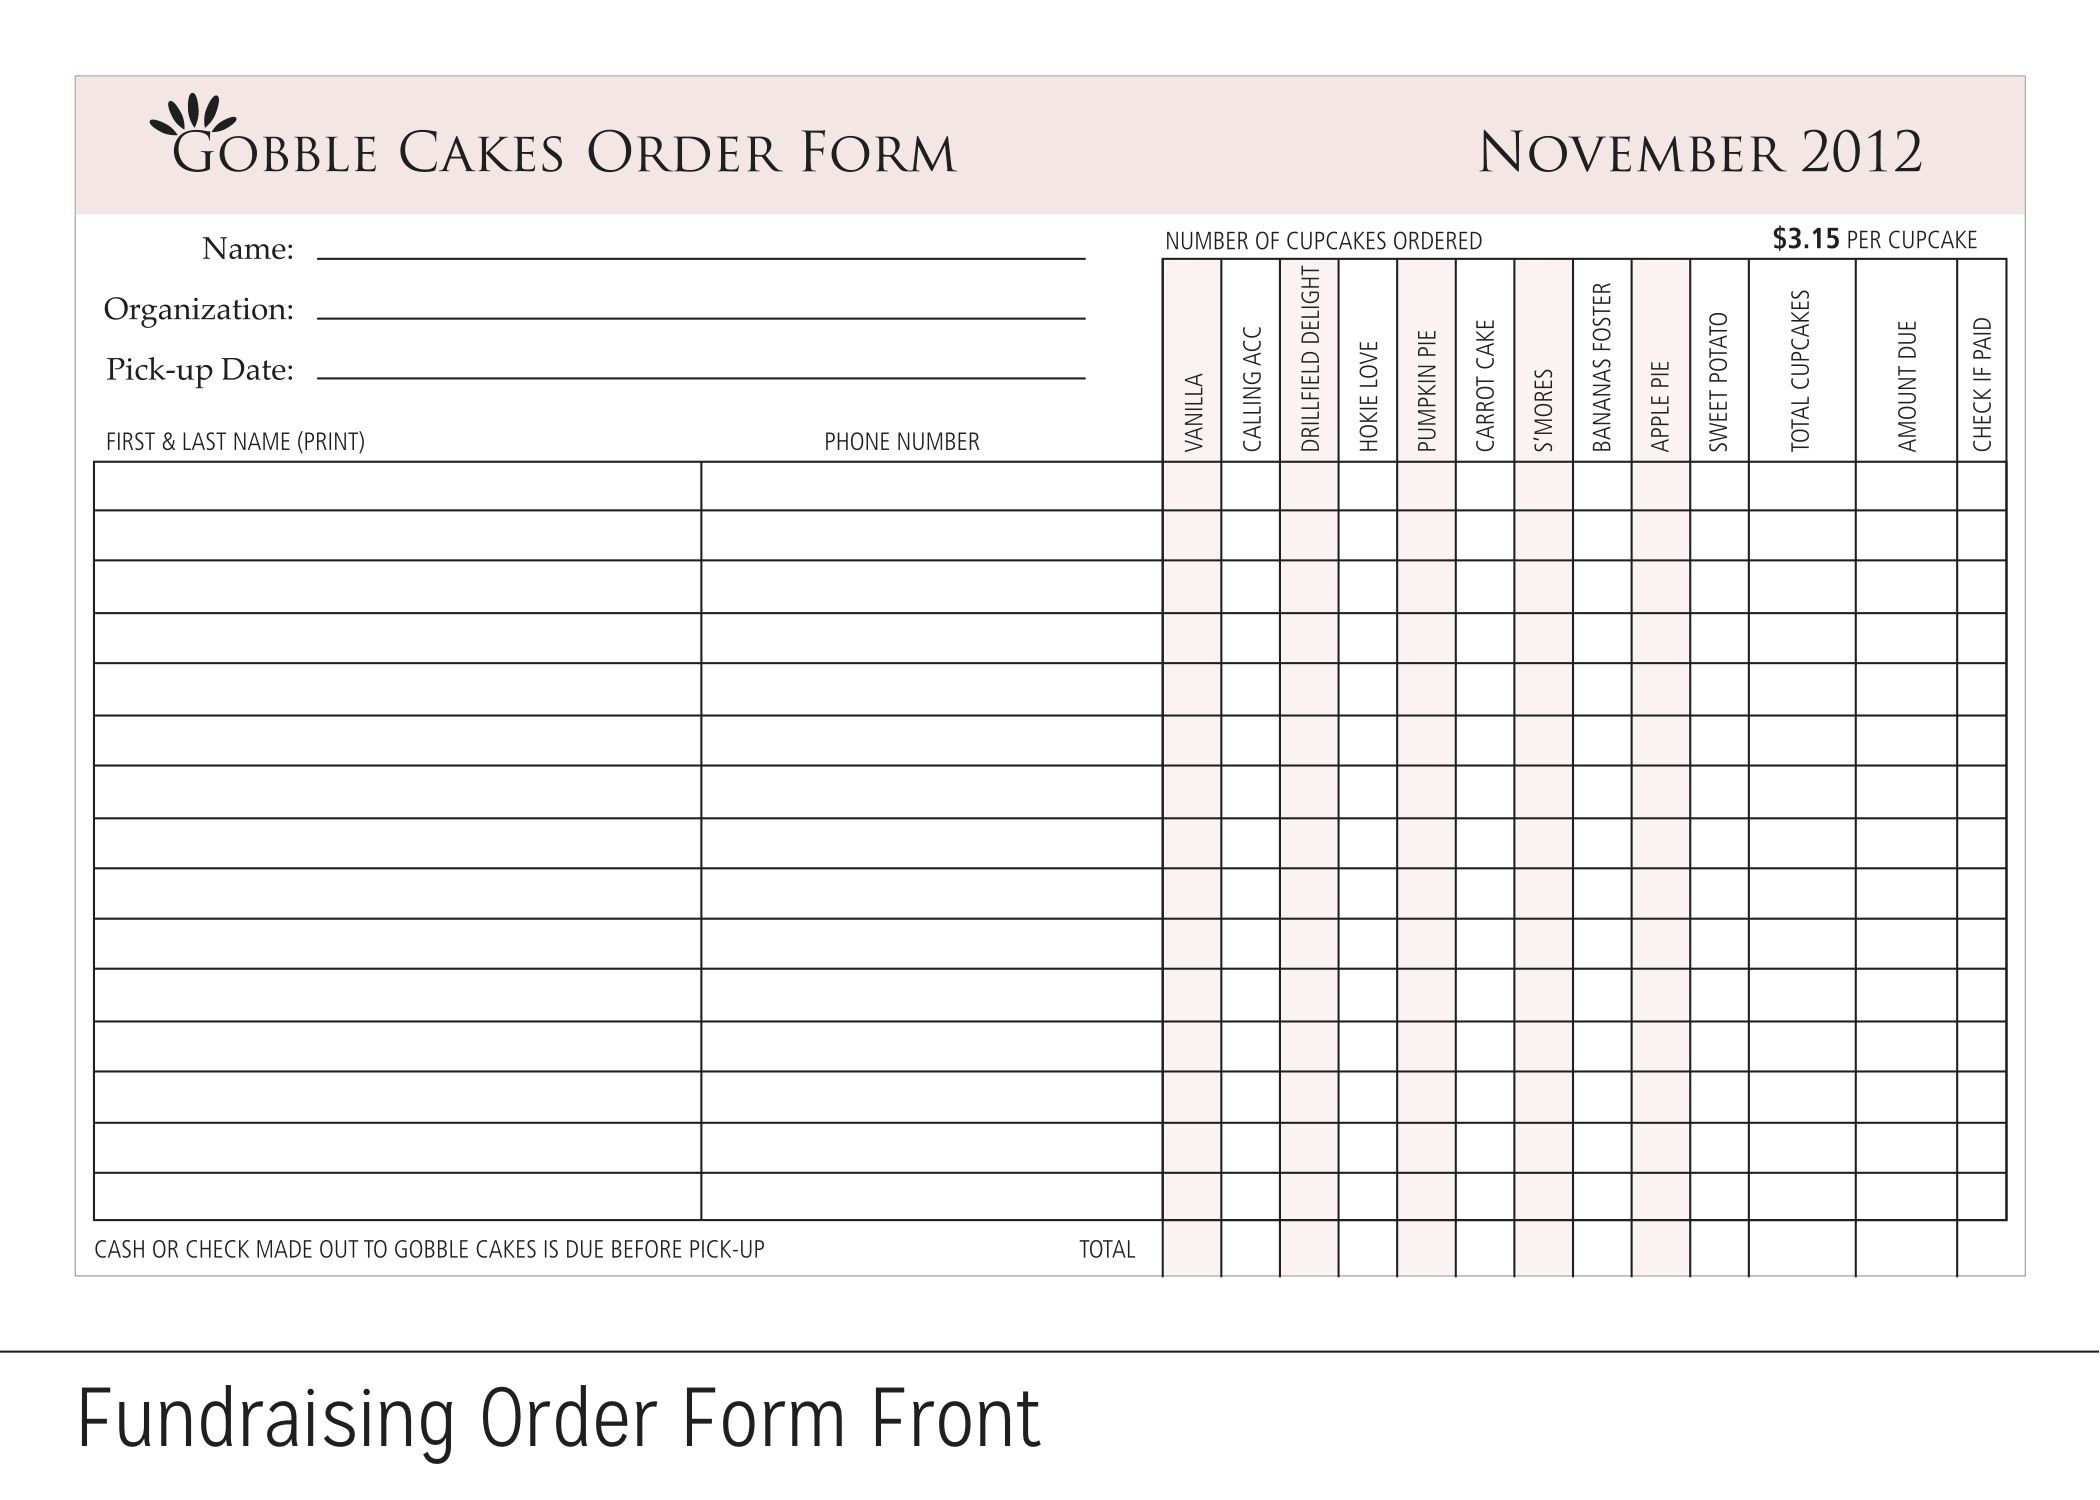 gobblecakes orderform front jpg  2100 u00d71500